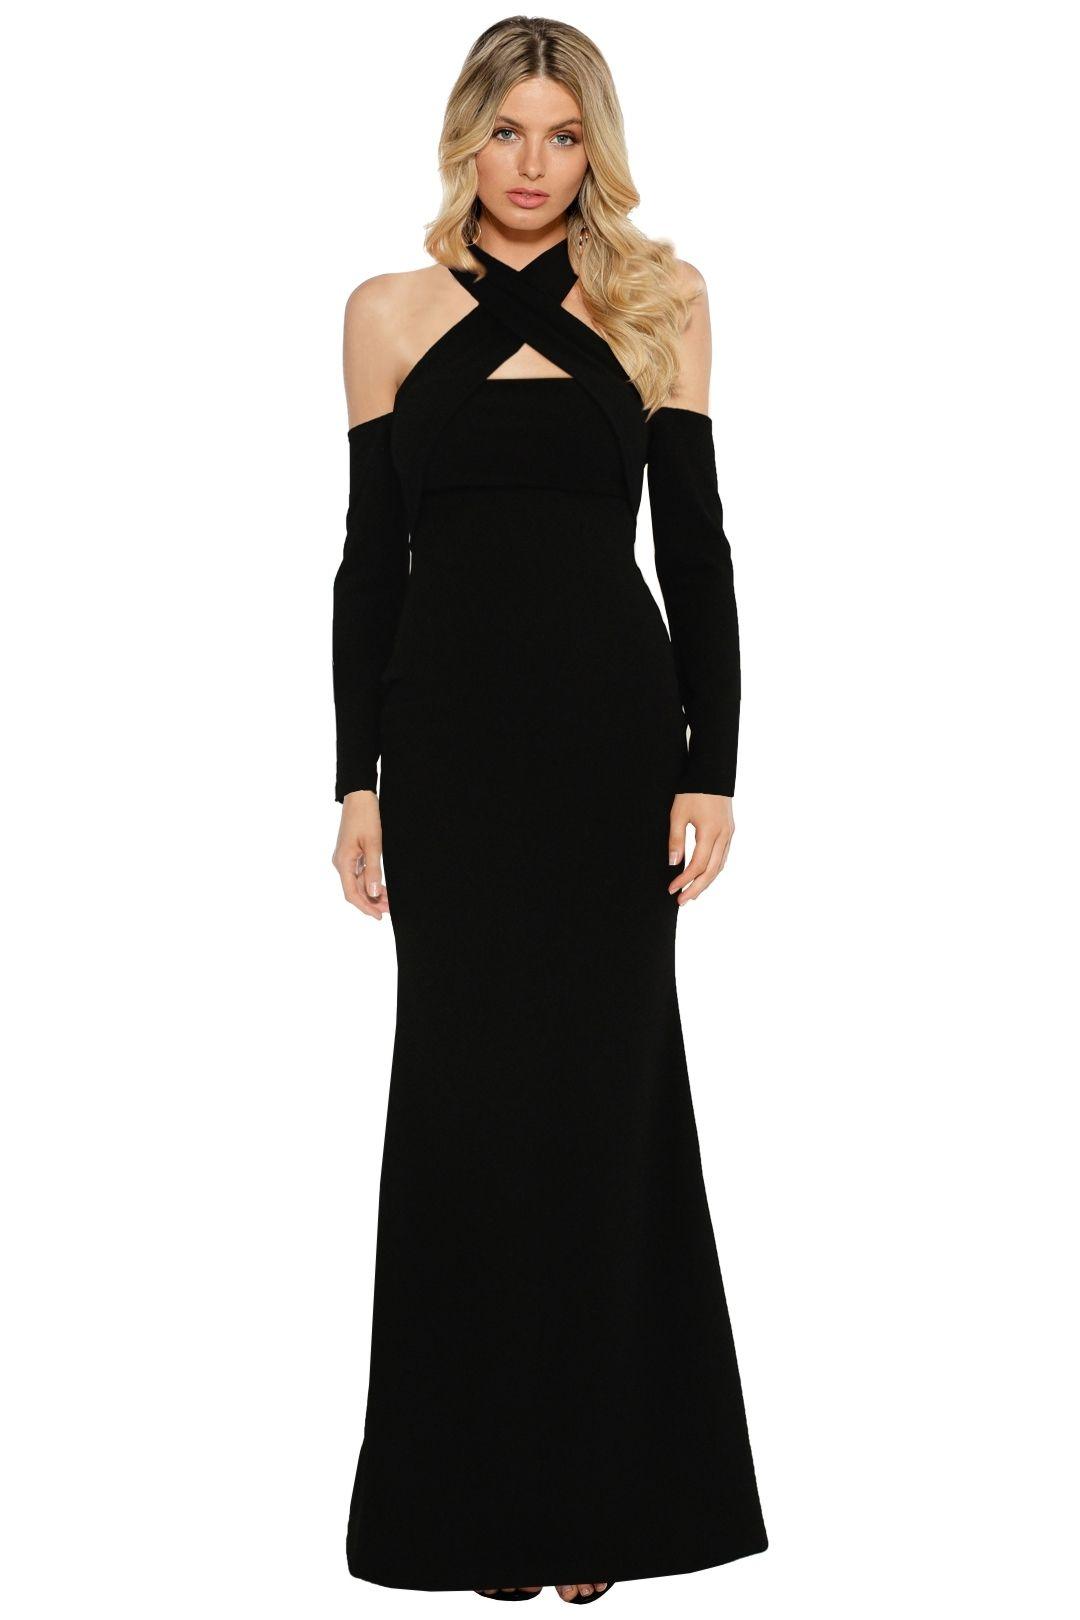 Pasduchas - Lyric LS Gown - Black - Front